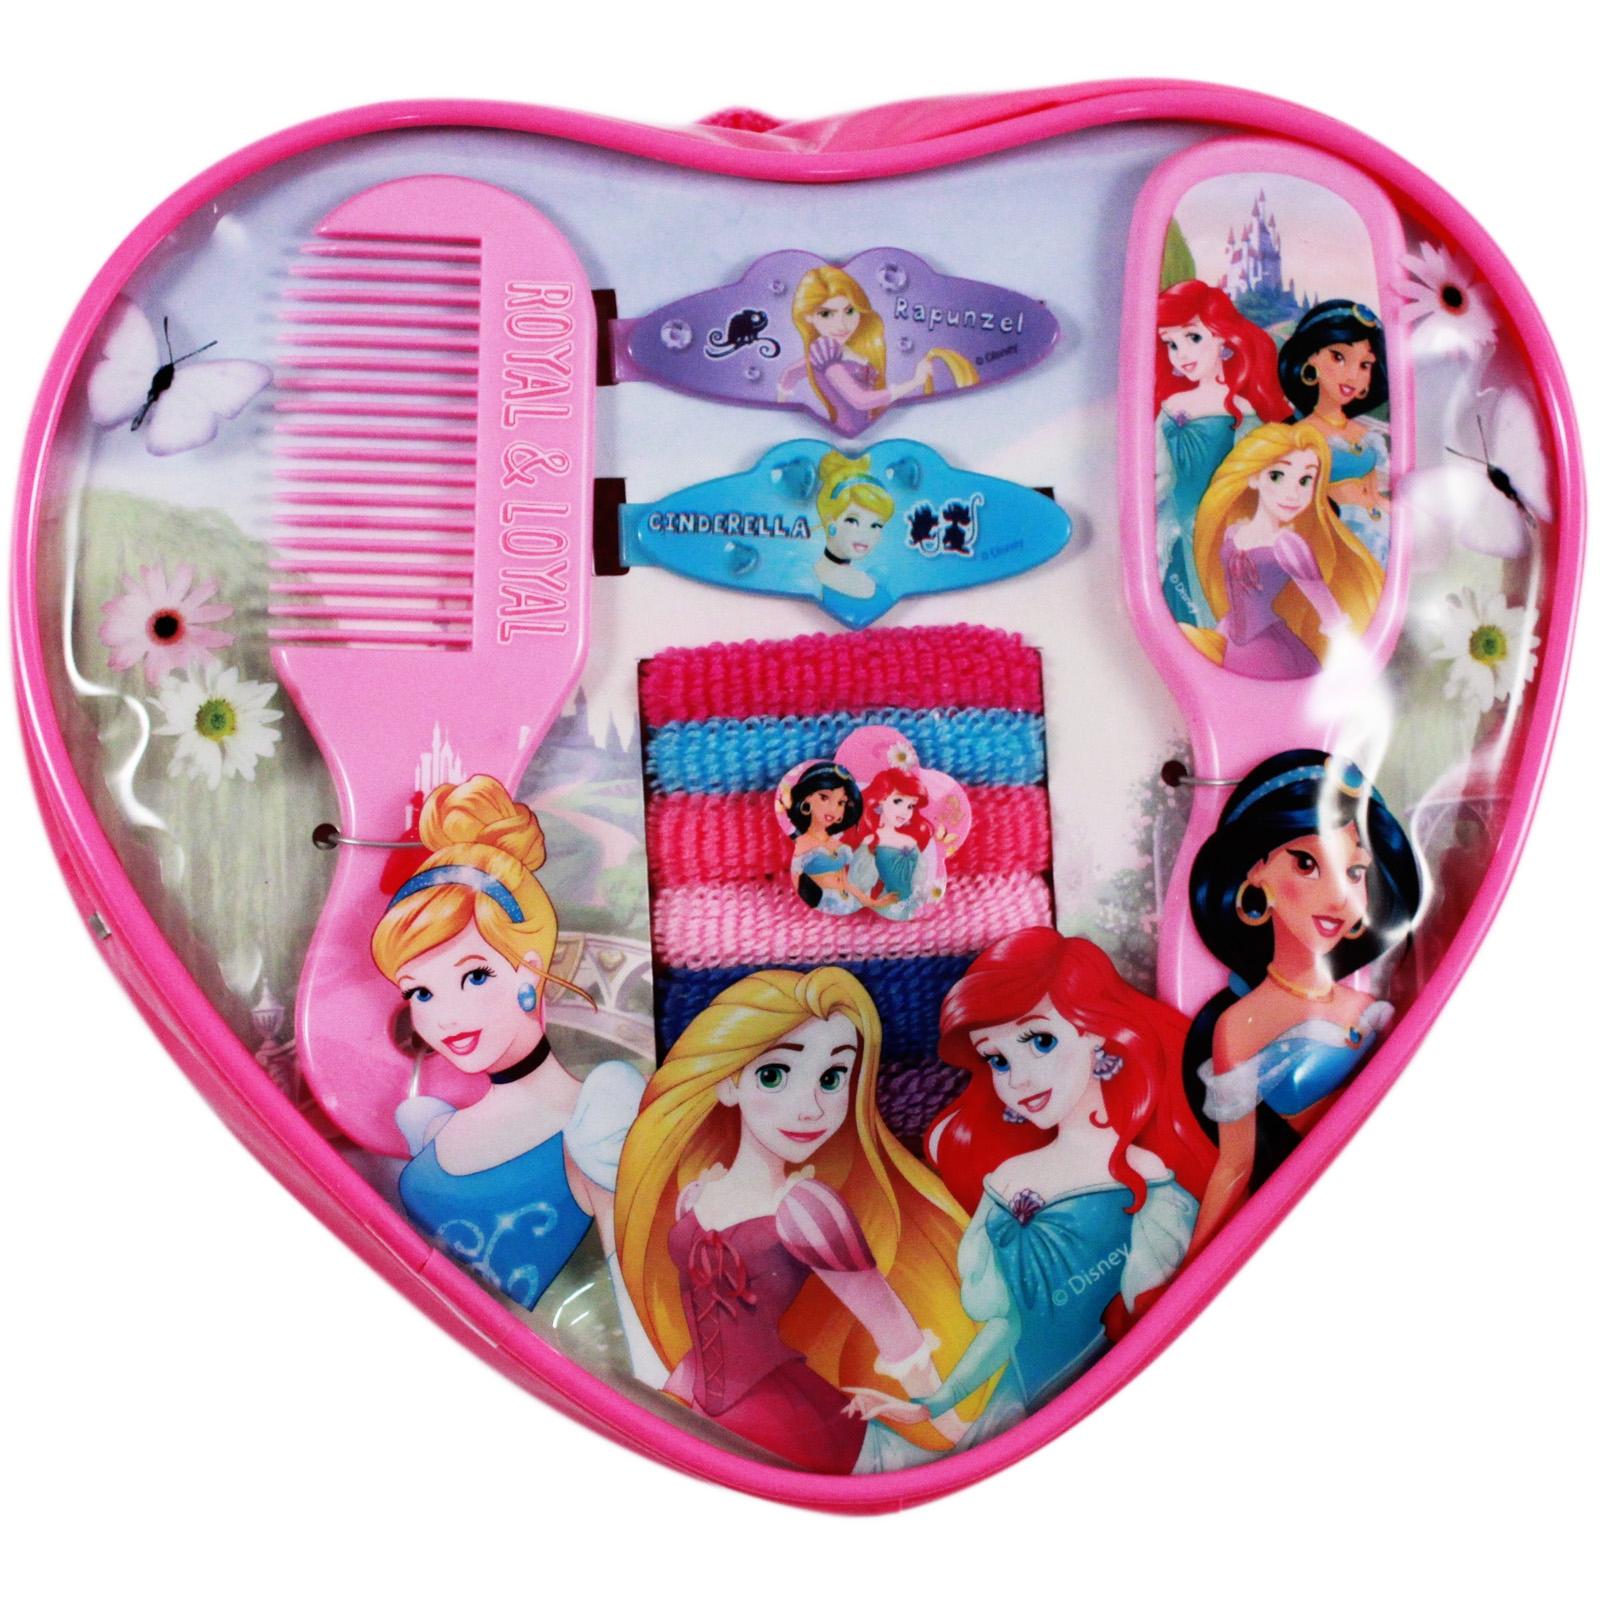 10pc Disney Princess Heart Shaped Hair Accessory Backpack